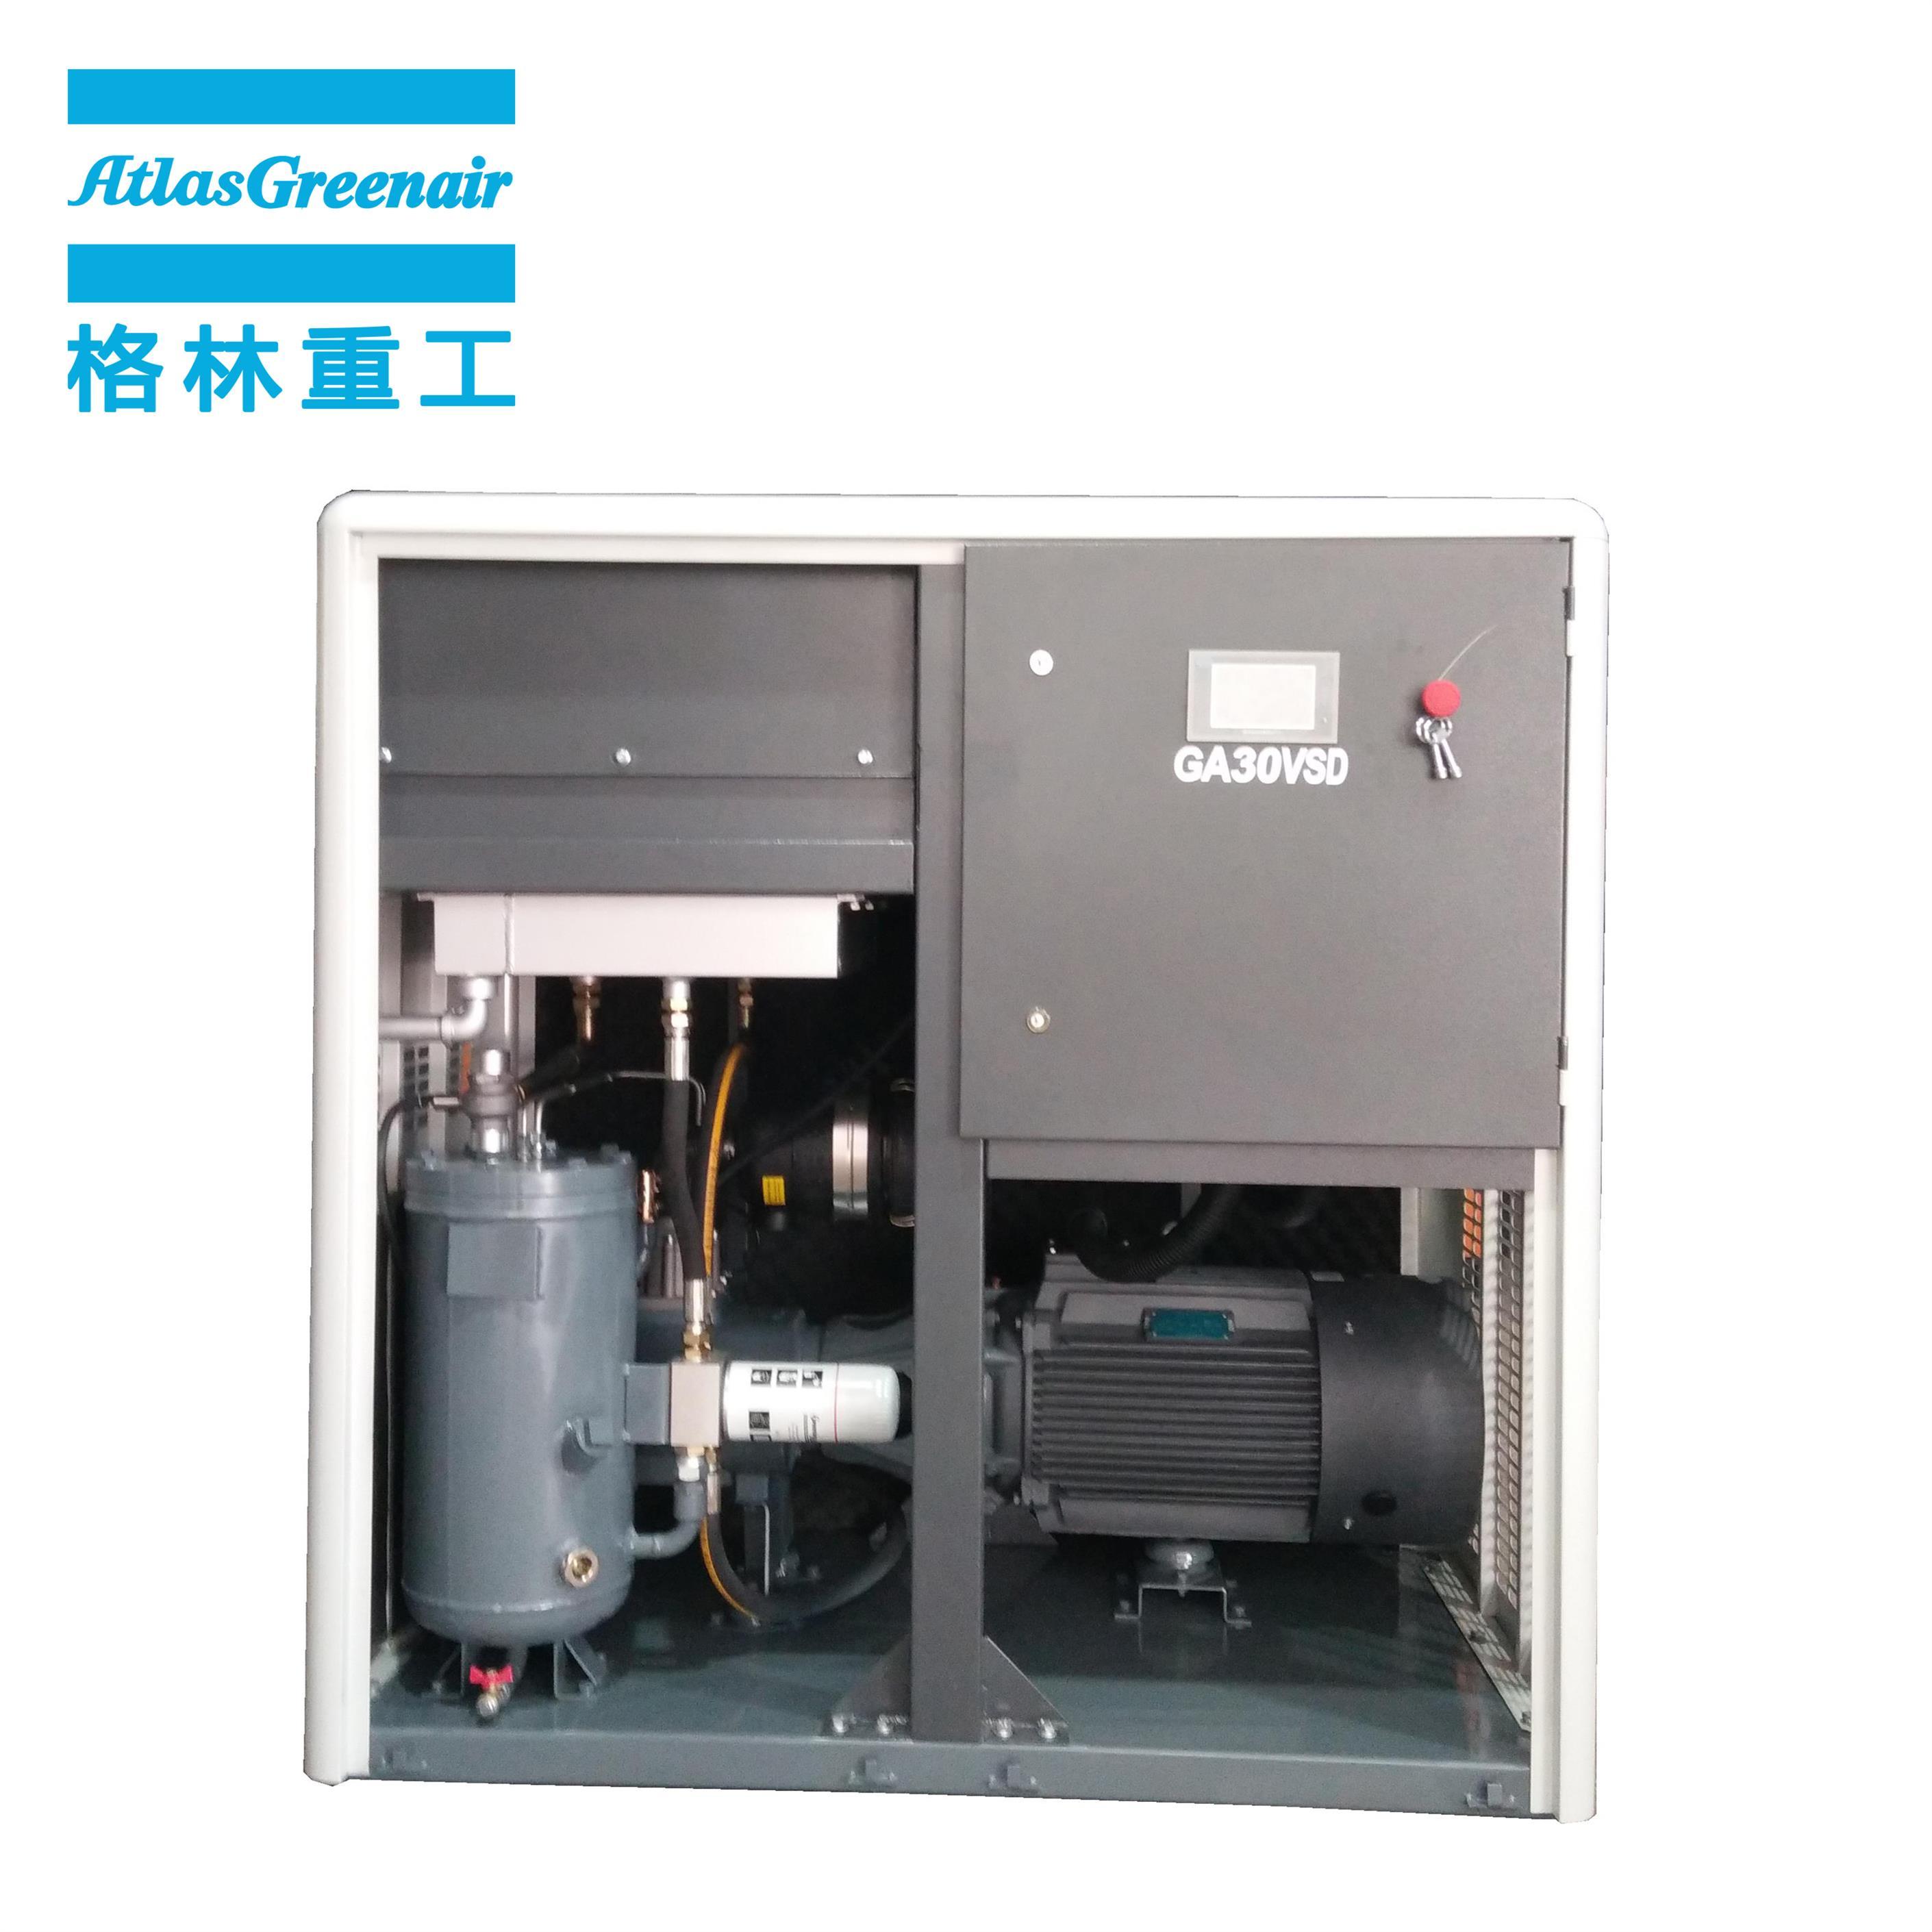 Atlas Greenair Screw Air Compressor custom variable speed air compressor manufacturer for sale-1